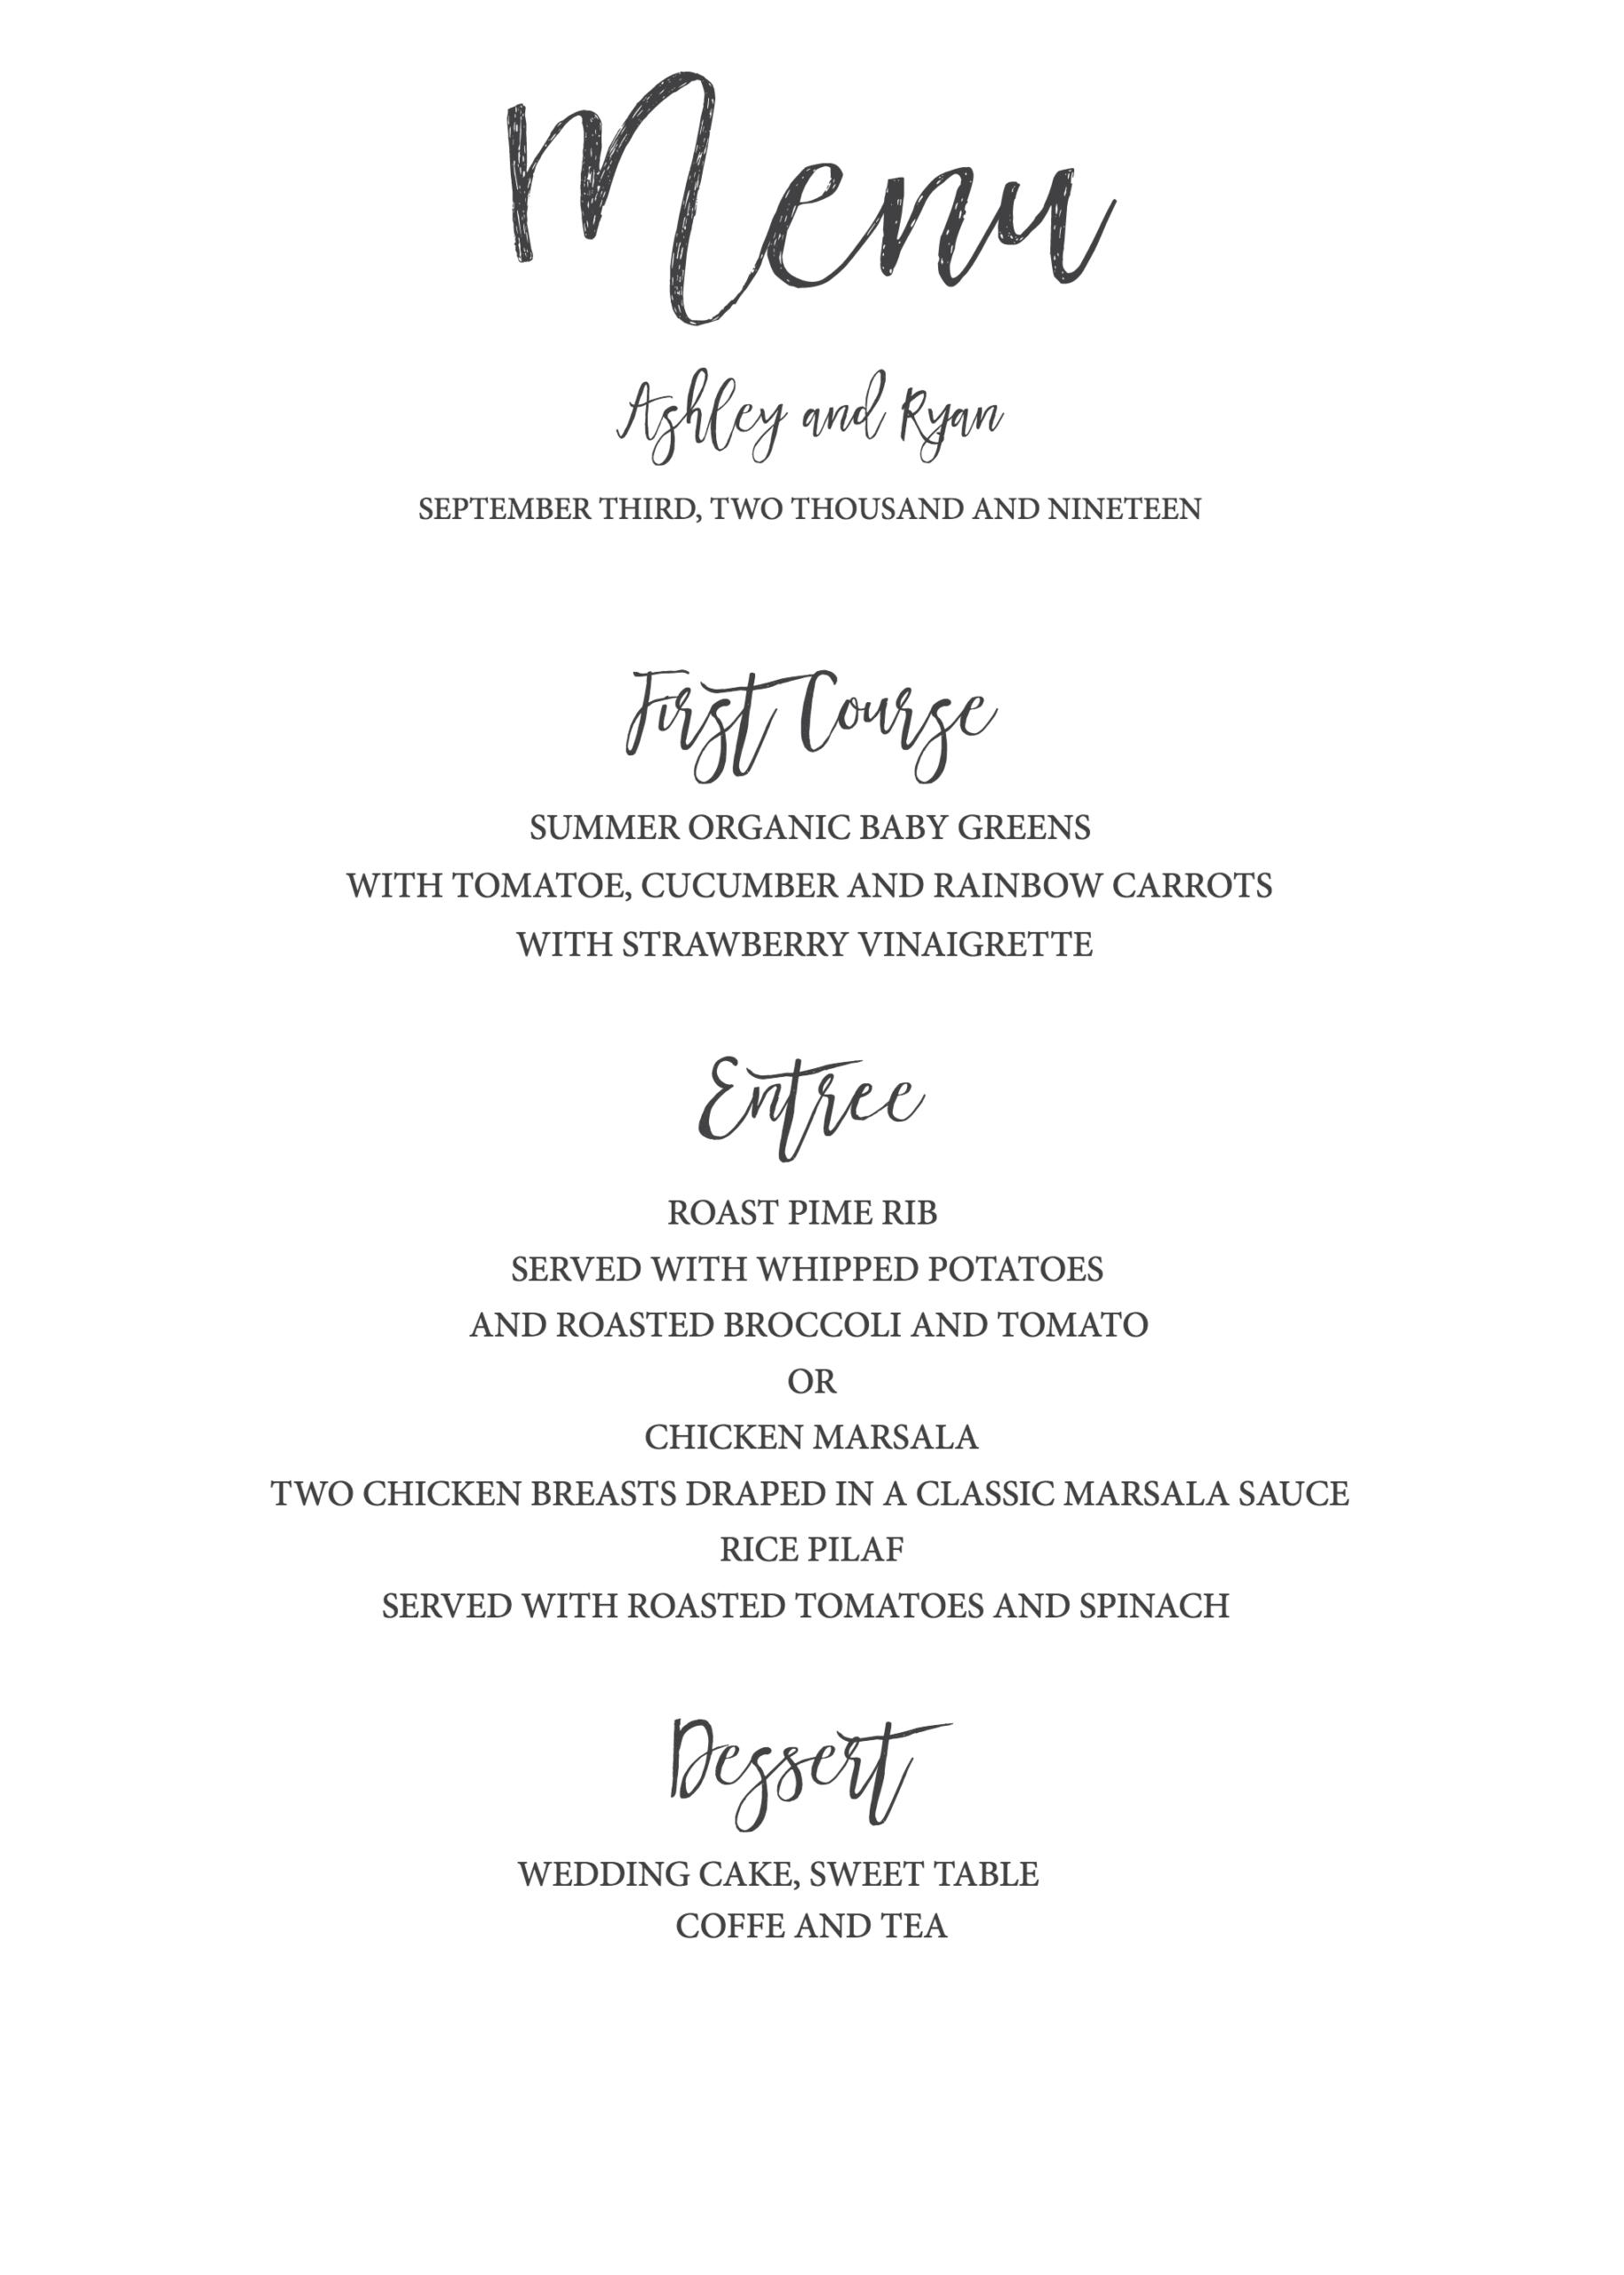 004 Free Printable Menu Template Stupendous Ideas Dinner With Regard To Free Printable Menu Templates For Wedding